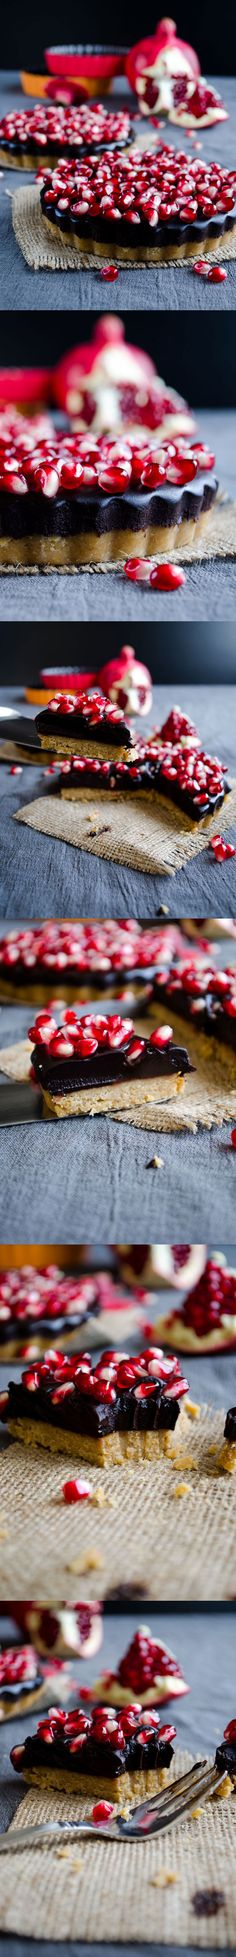 No-Bake Chocolate Pomegranate Tart